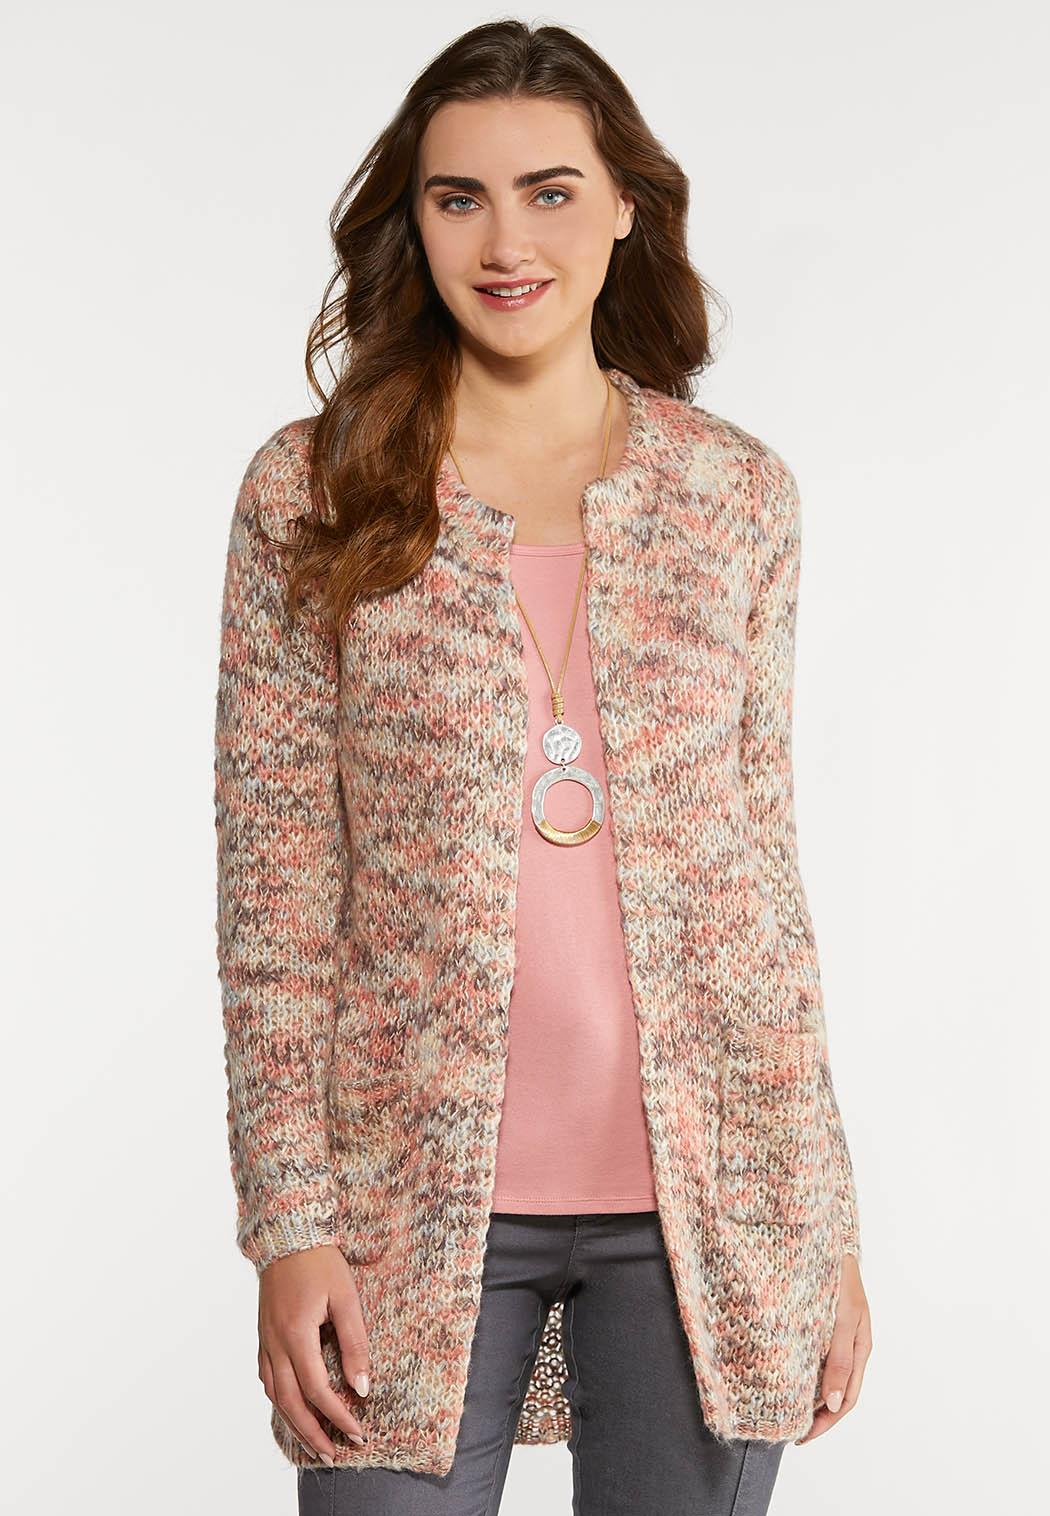 Plus Size Berry Sweet Cardigan Sweater